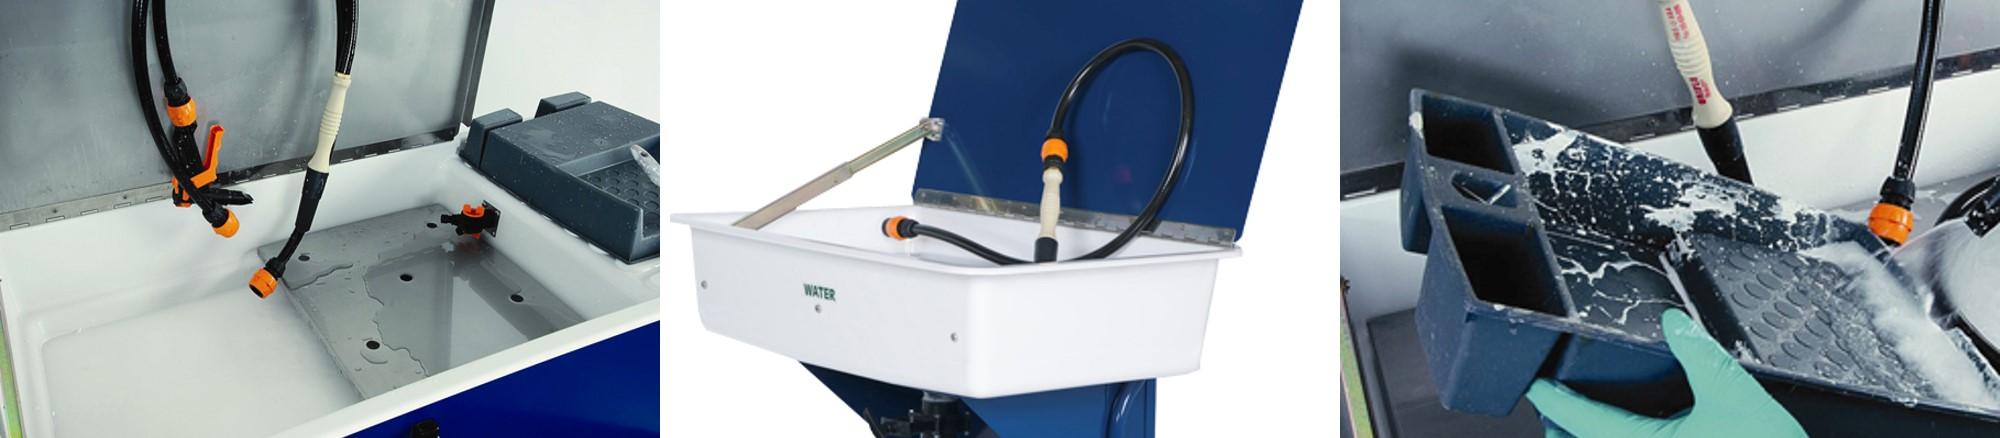 Yorkshire Spray Services Ltd - Unic Decorators Cleaners